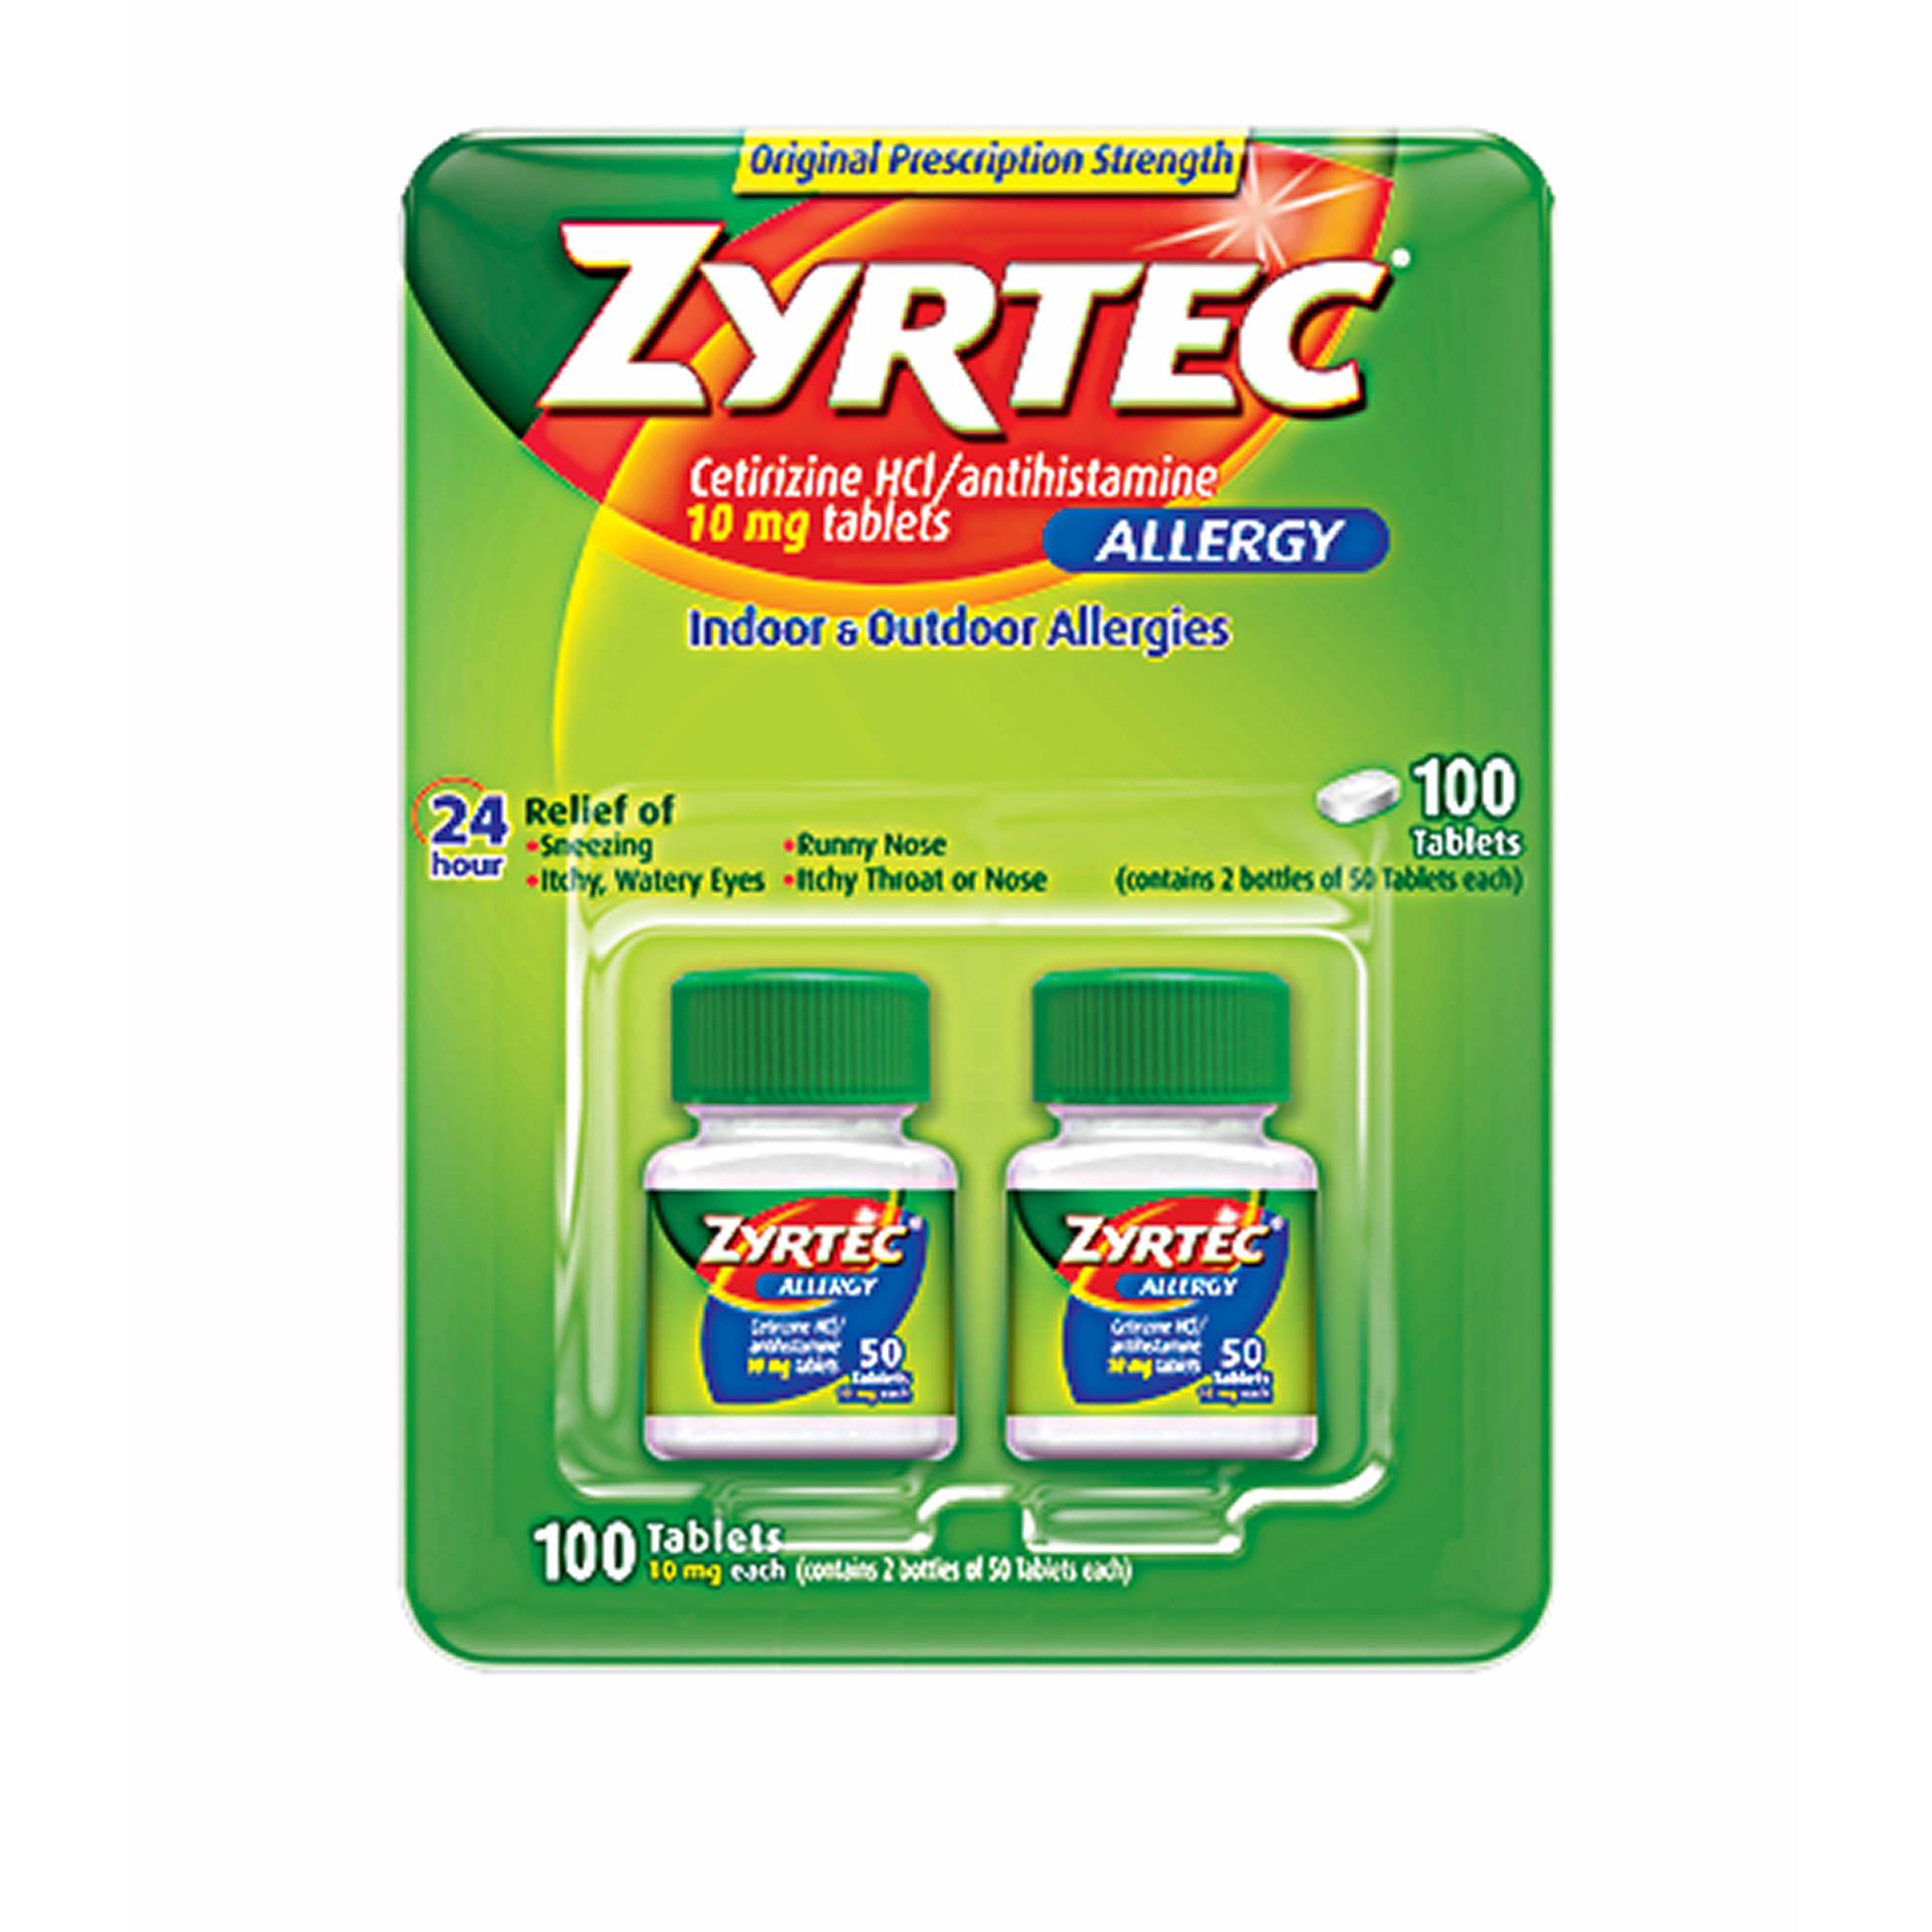 Zyrtec Prescription Strength Allergy Medicine 10mg Tablets With